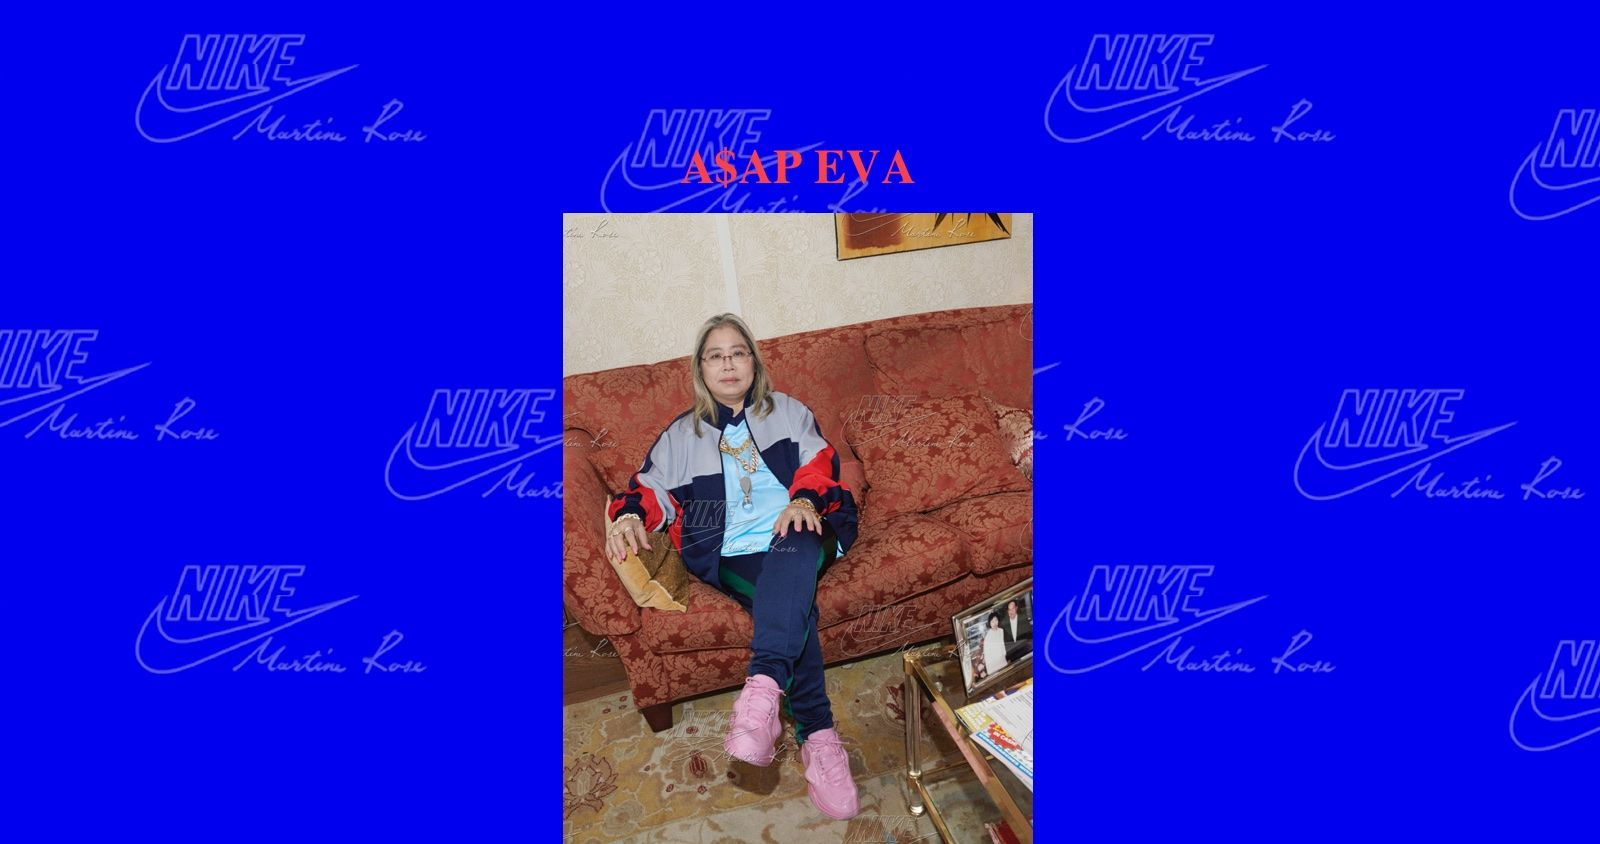 NikeLab_Martine Rose_CDP_DT_P4a.jpg